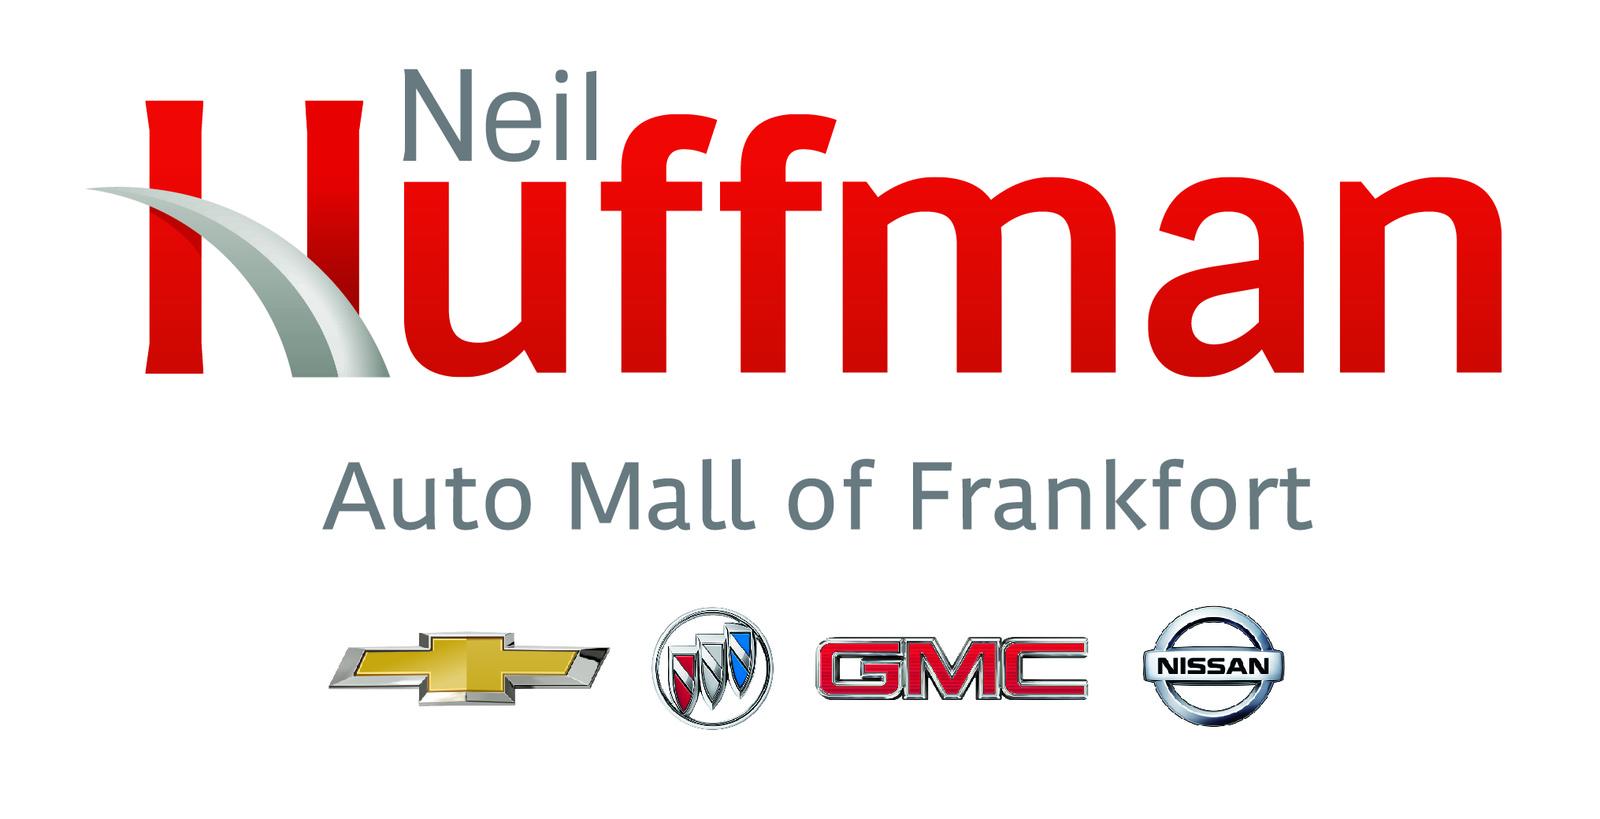 Neil Huffman Chevrolet Buick Gmc Nissan Frankfort Ky